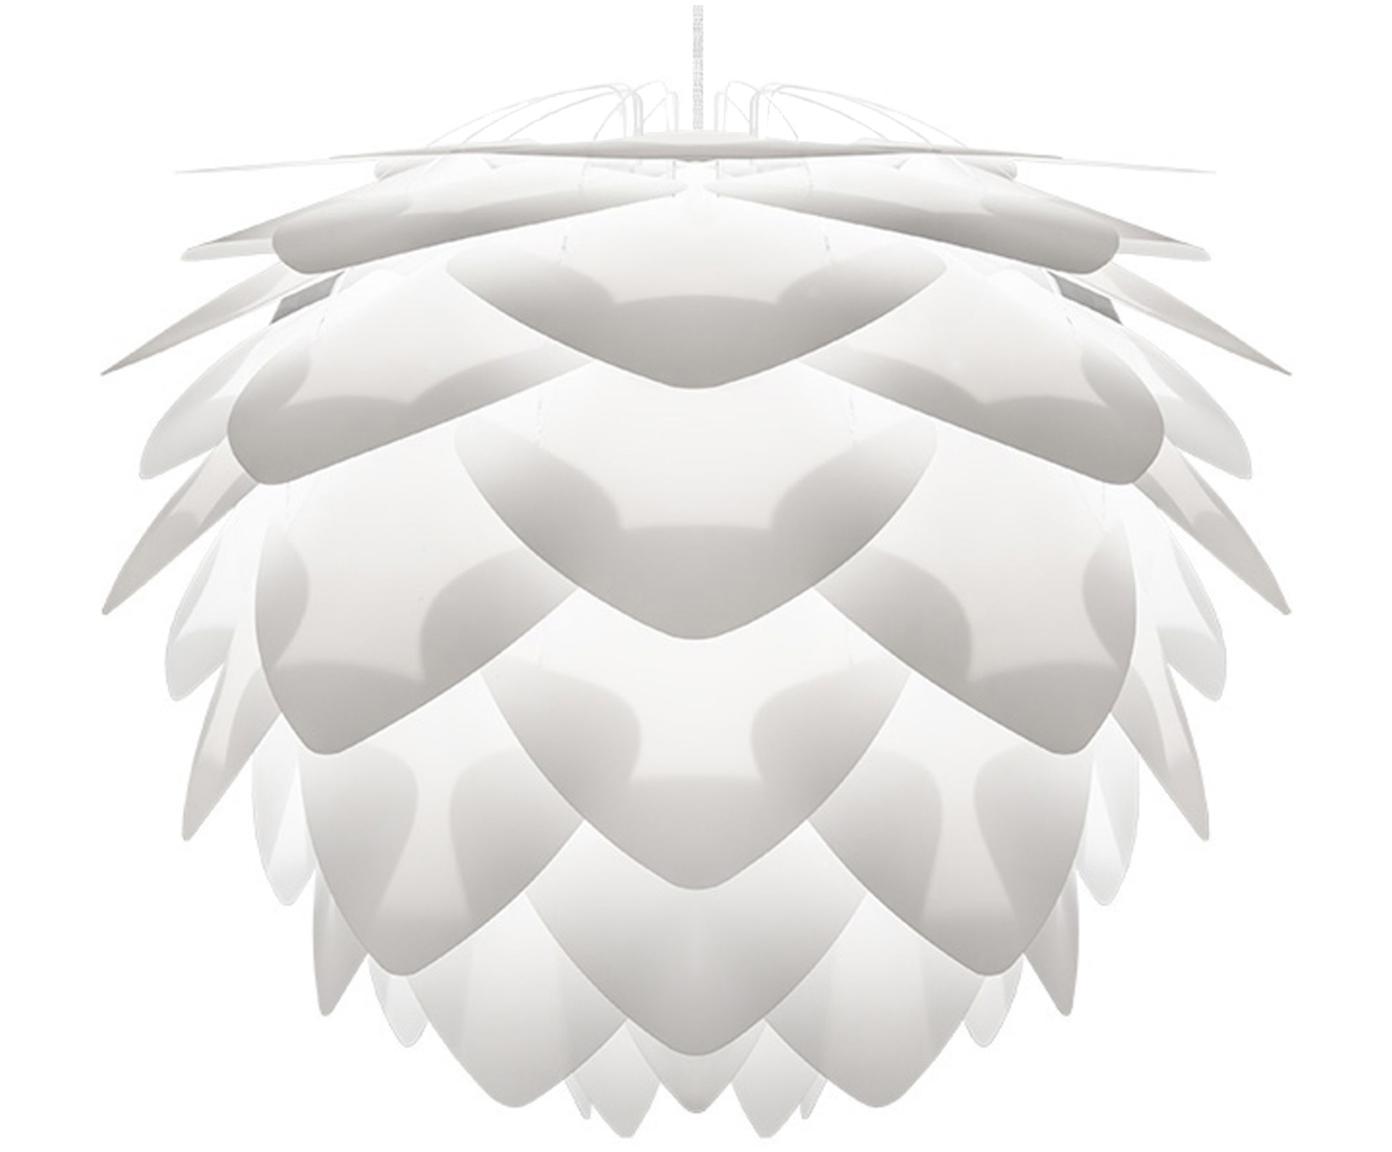 Lampada a sospensione Silvia, Paralume: polipropilene, Bianco, Ø 32 x Alt. 25 cm